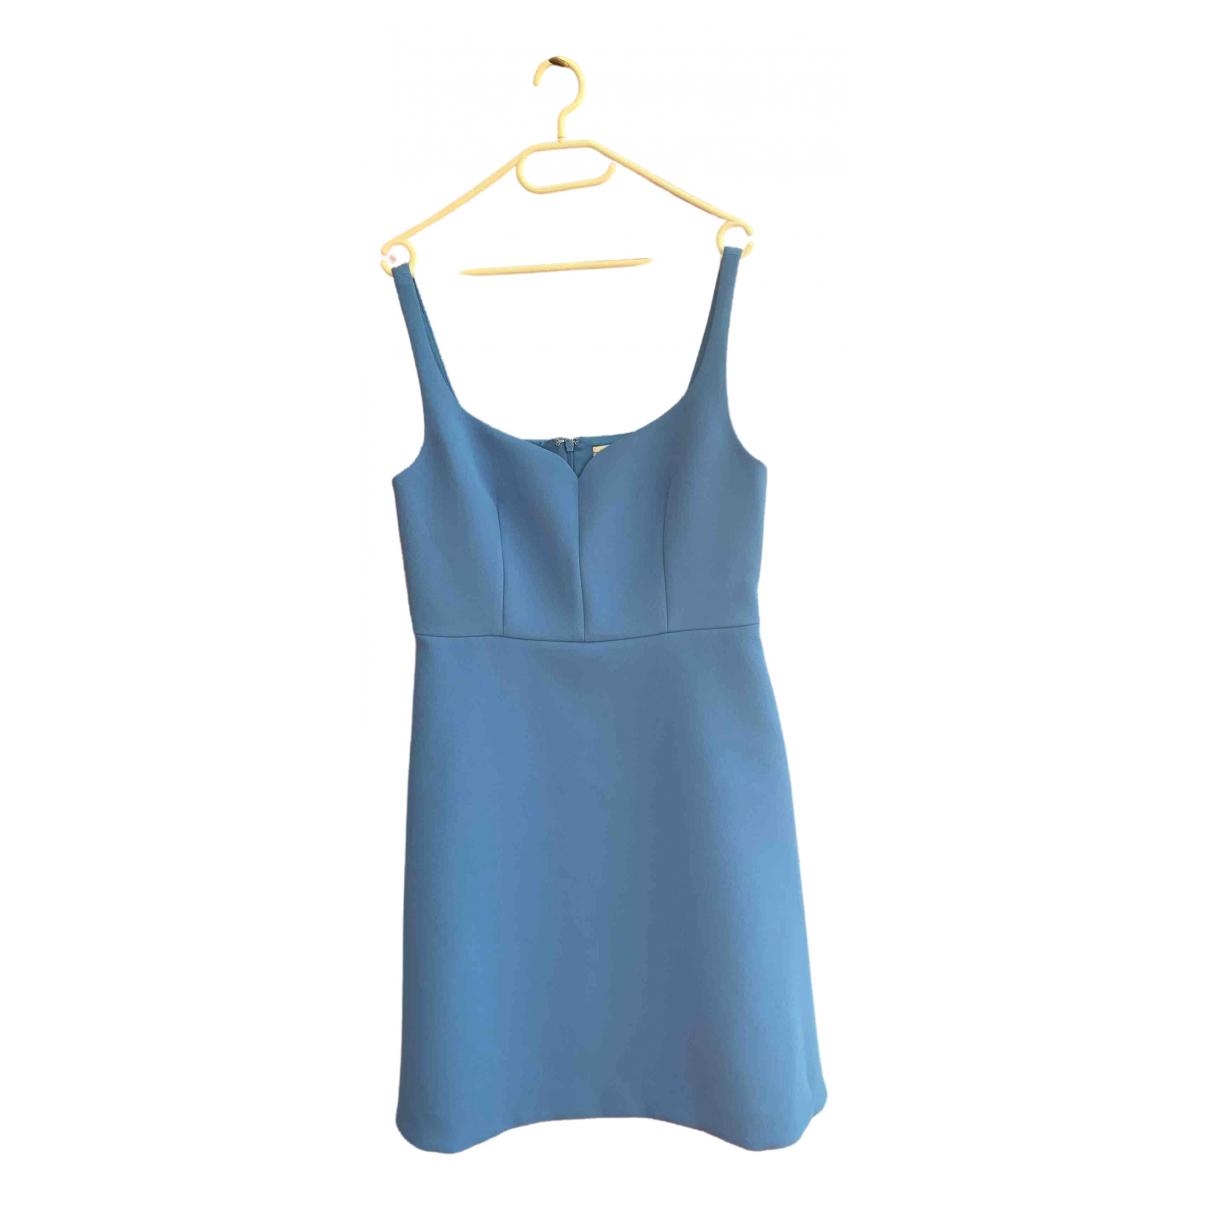 & Stories \N Blue dress for Women 12 US